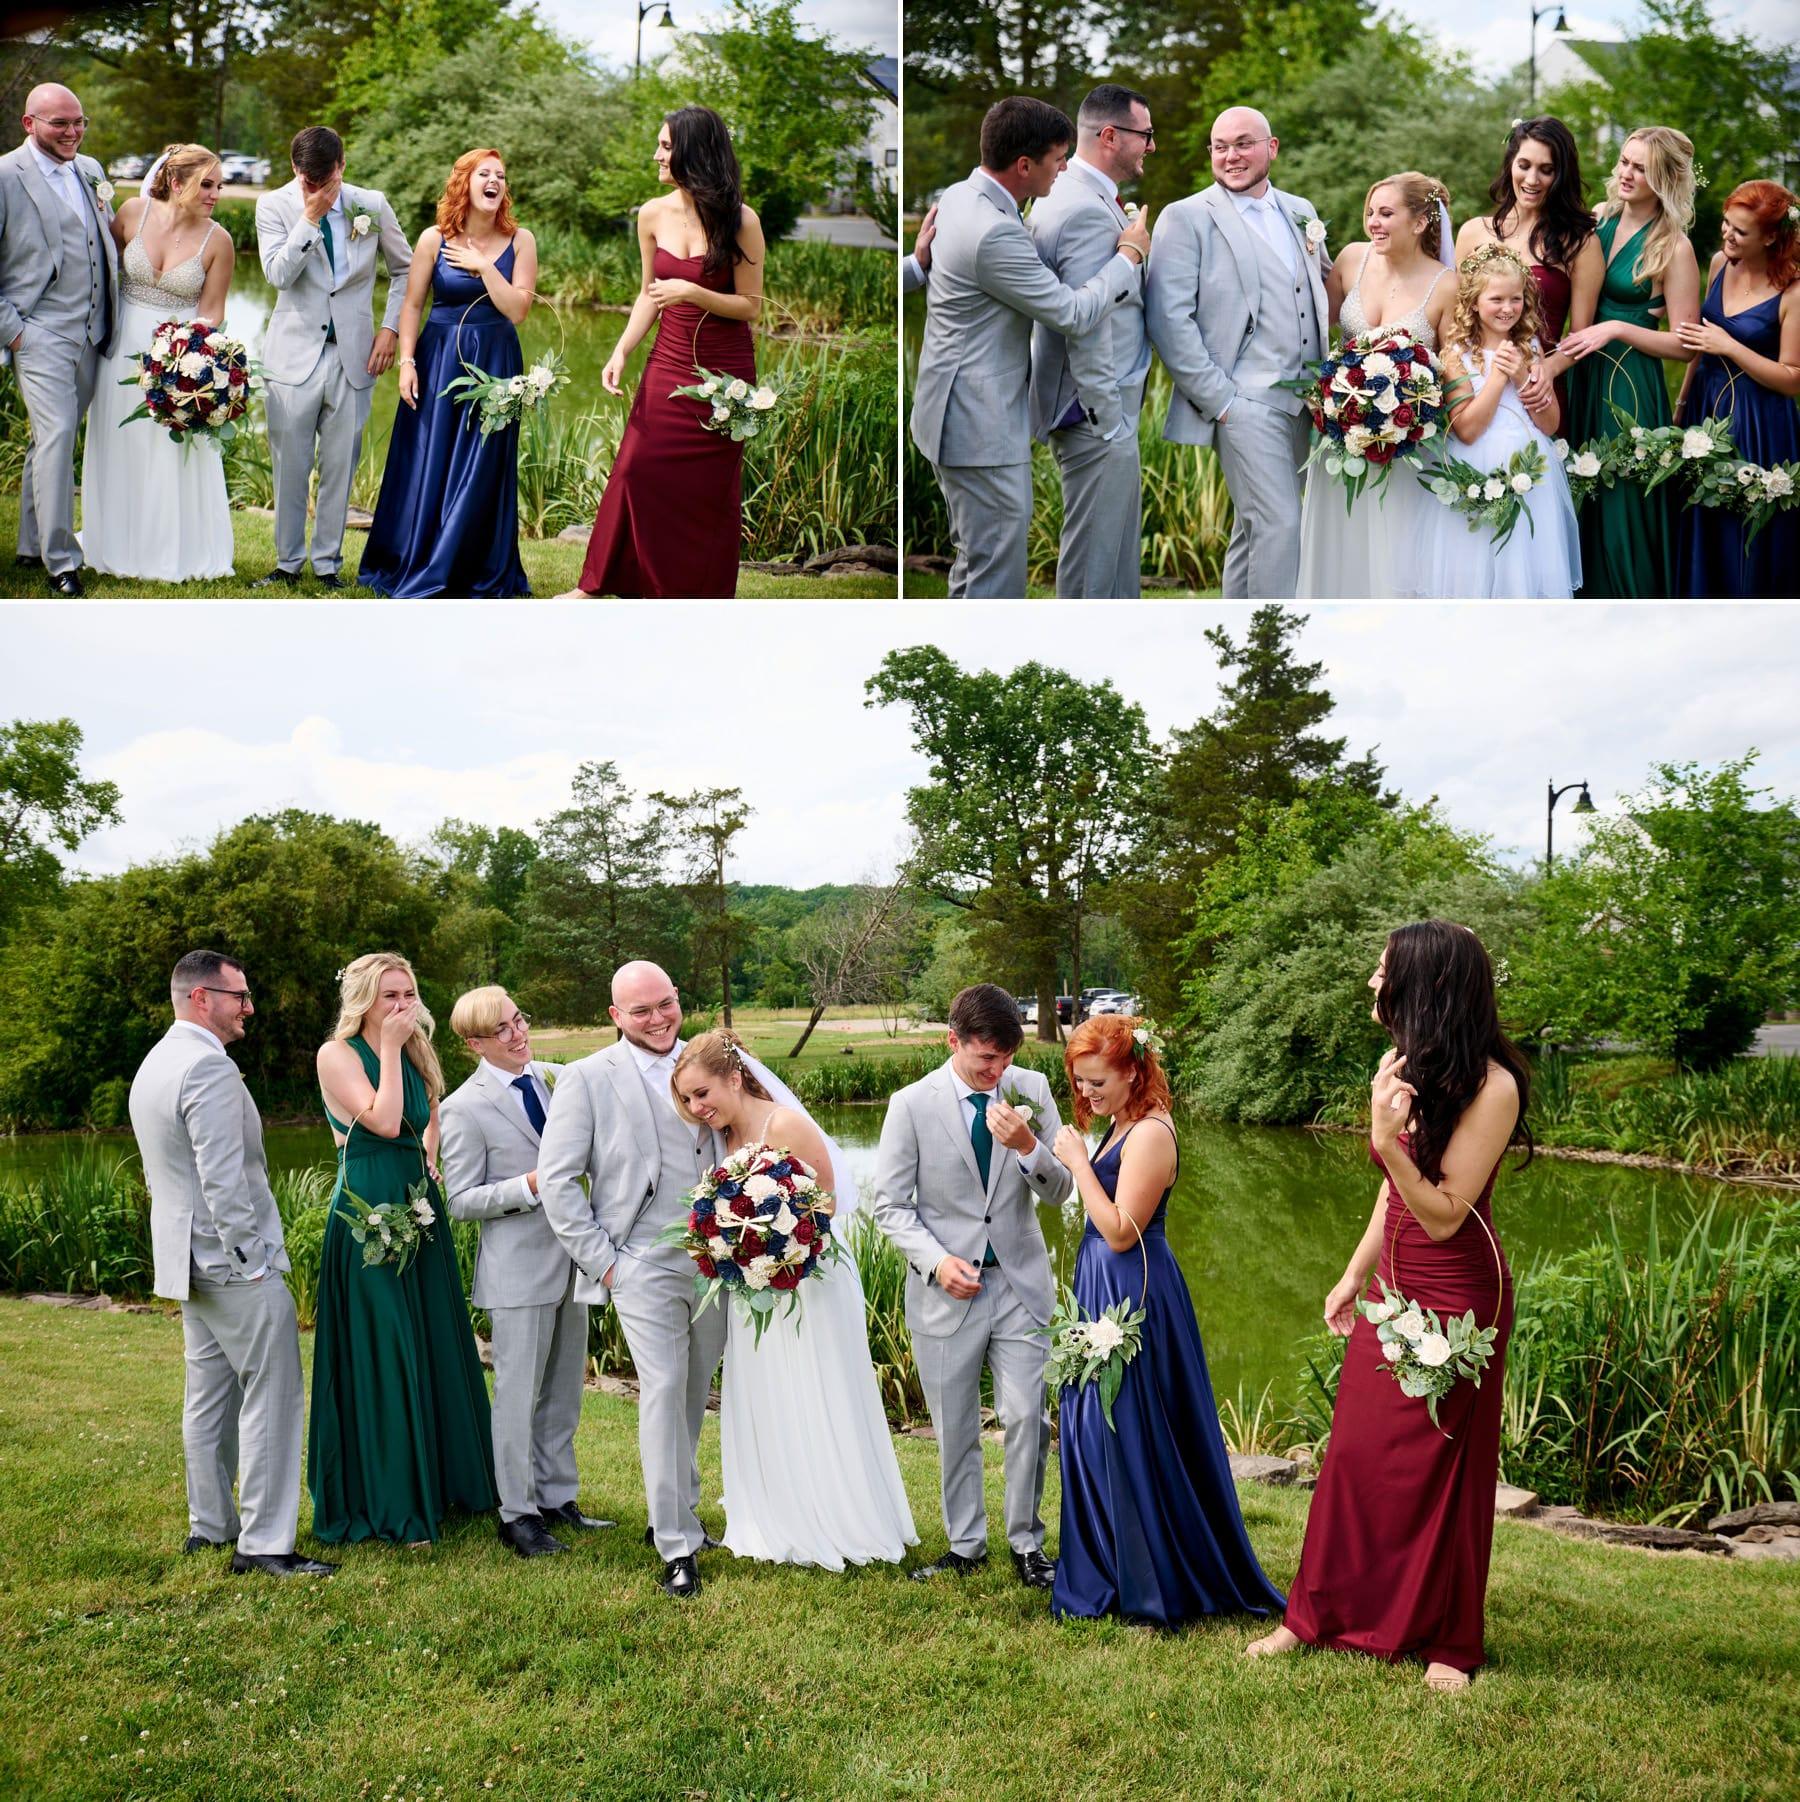 bridal party wedding photos at Brick Farm Tavern